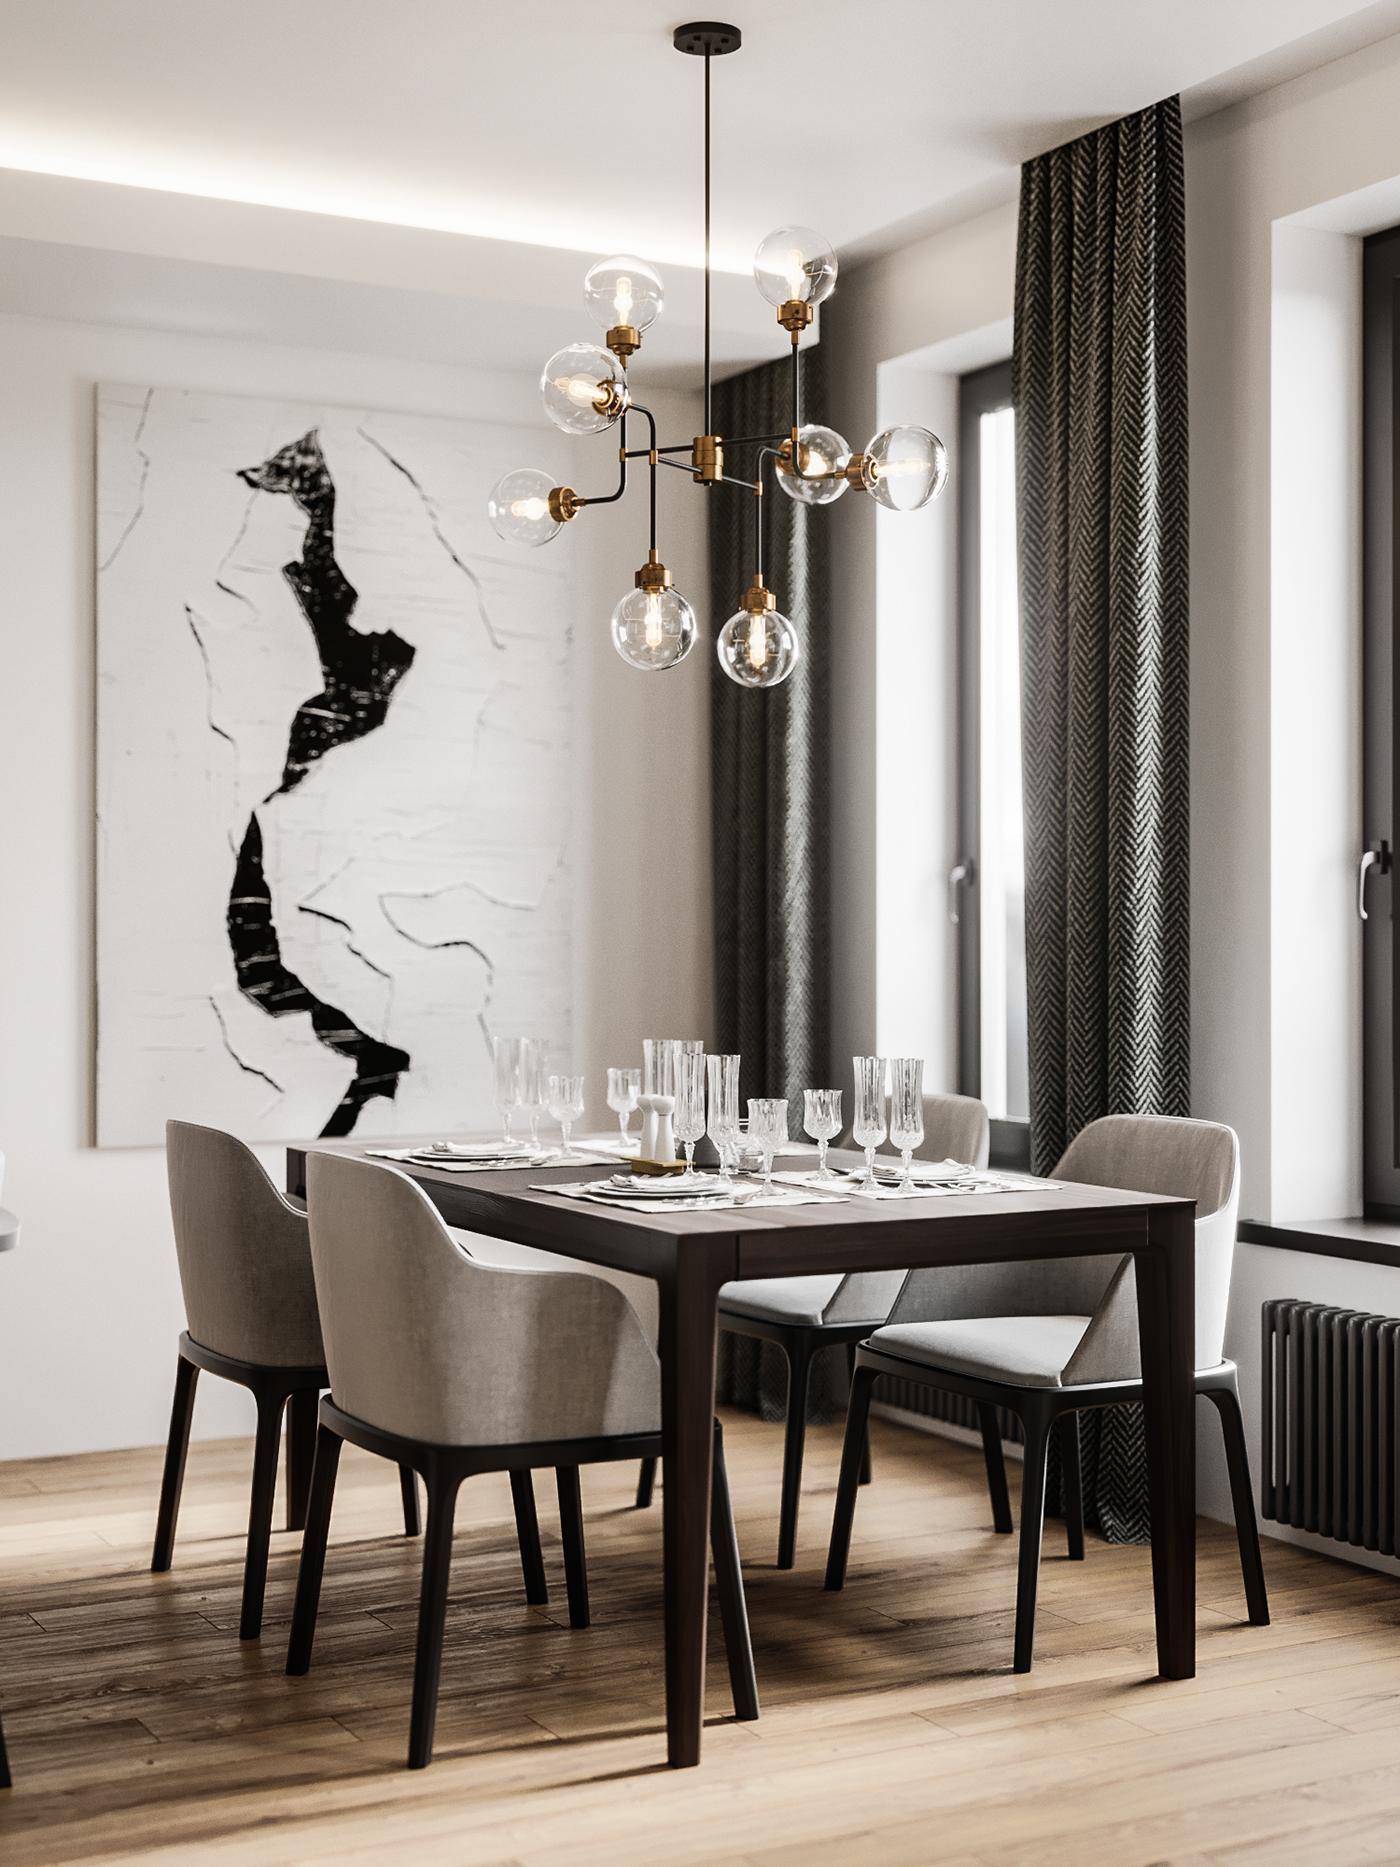 3ds max corona Render photoshop minsk belarus Moscow design Vizualization furniture